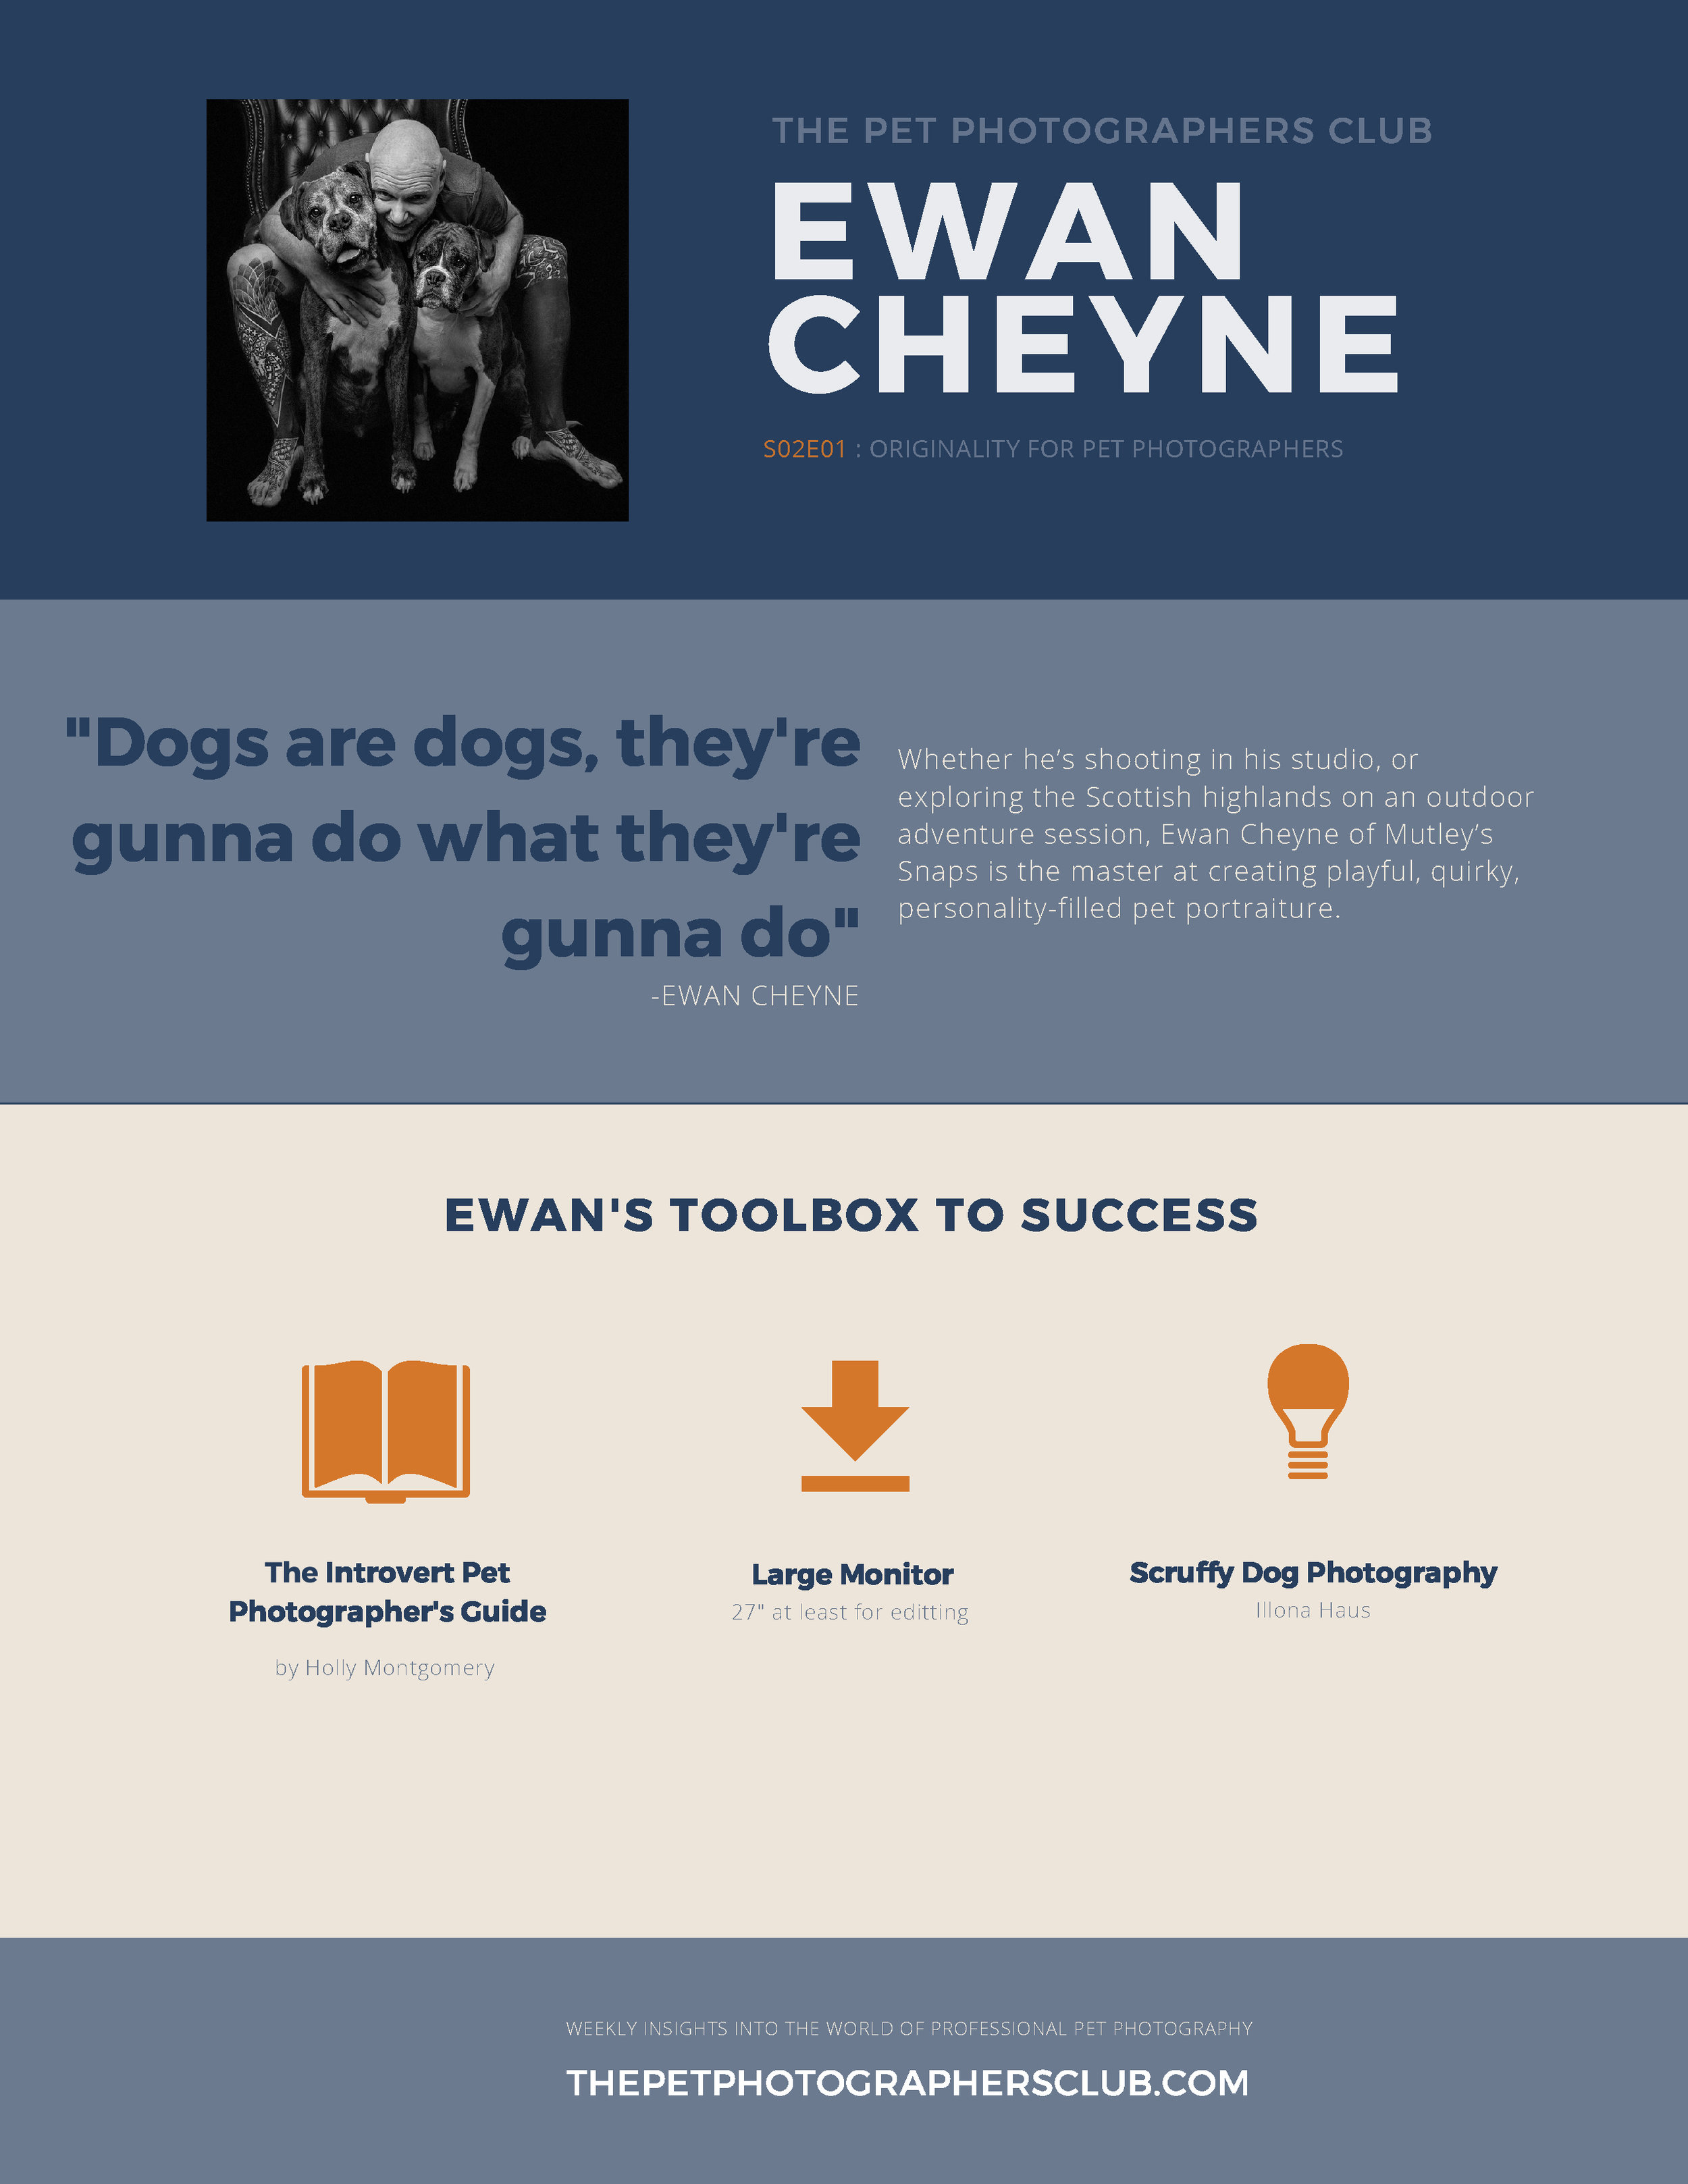 TOOLBOX TO SUCCESS- Pinterest- Ewan Cheyne Mutleys Snaps.jpg